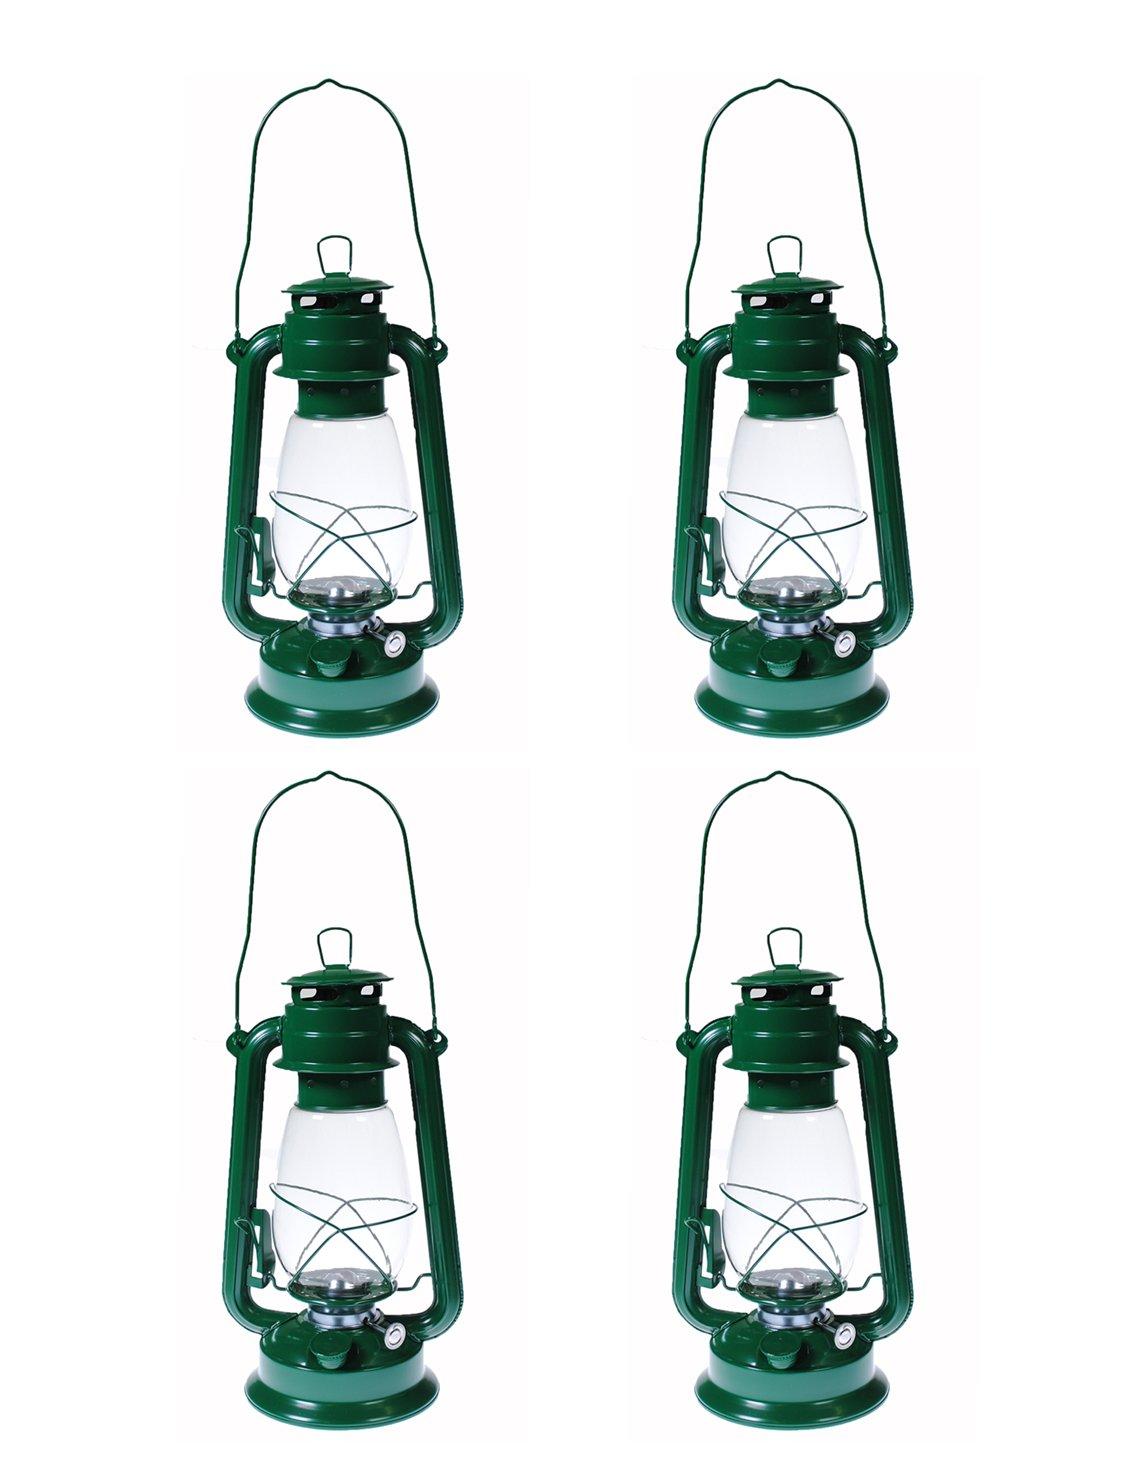 Shop4Omni S4O Hanging Hurricane Lantern/Elegant Wedding Light/Table Centerpiece Lamp - 12 Inches (4, Green)